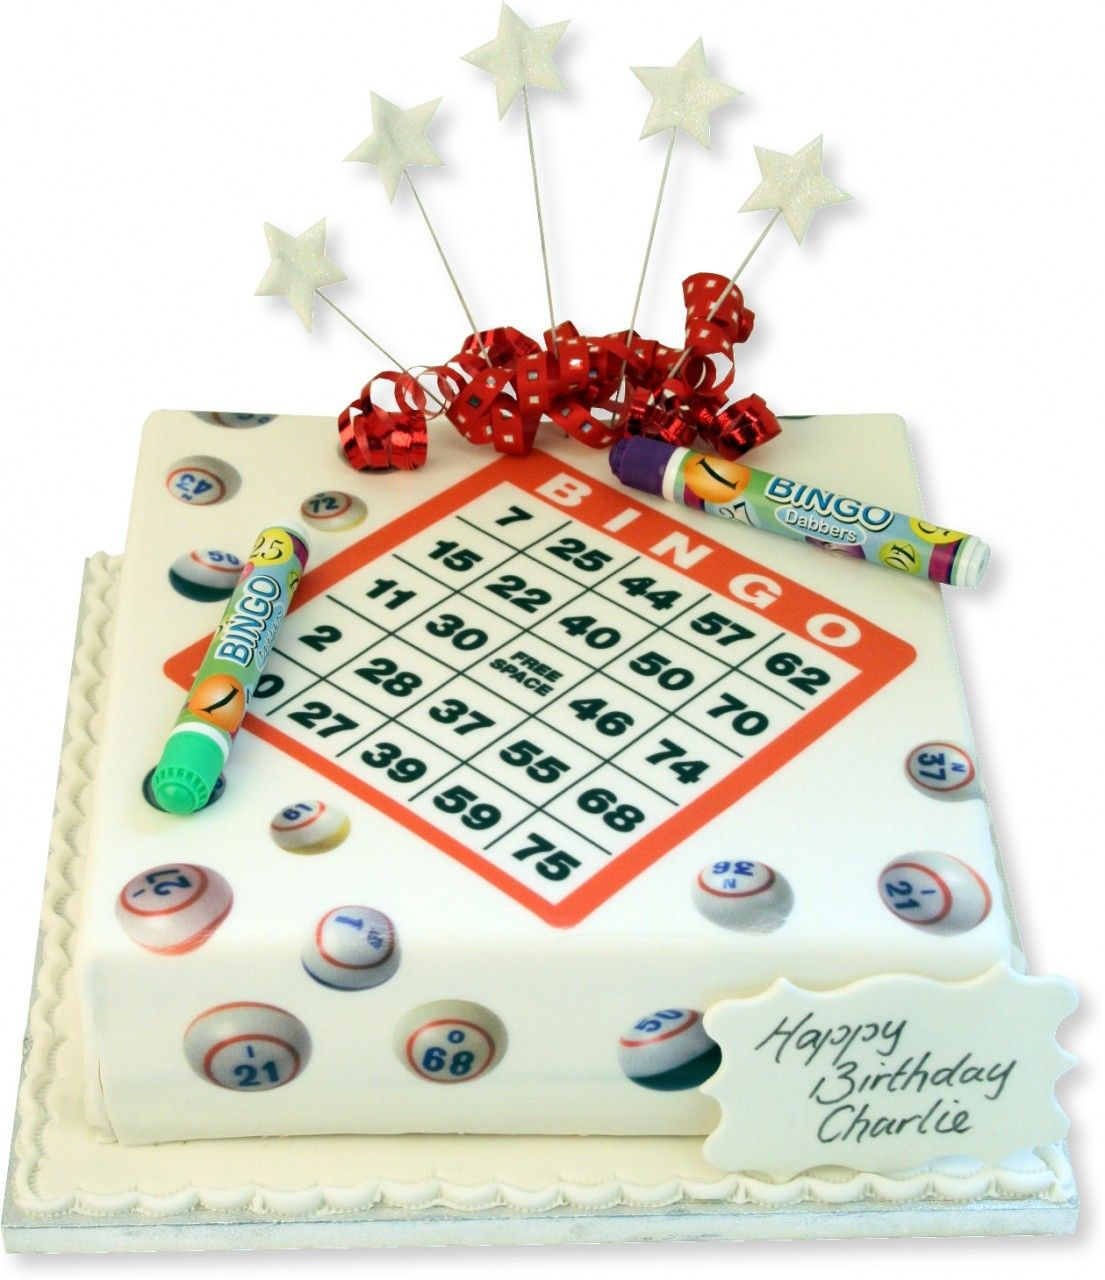 CAKES ADULT BIRTHDAY GIRLIE Bingo Cake Cakes fProfessionals